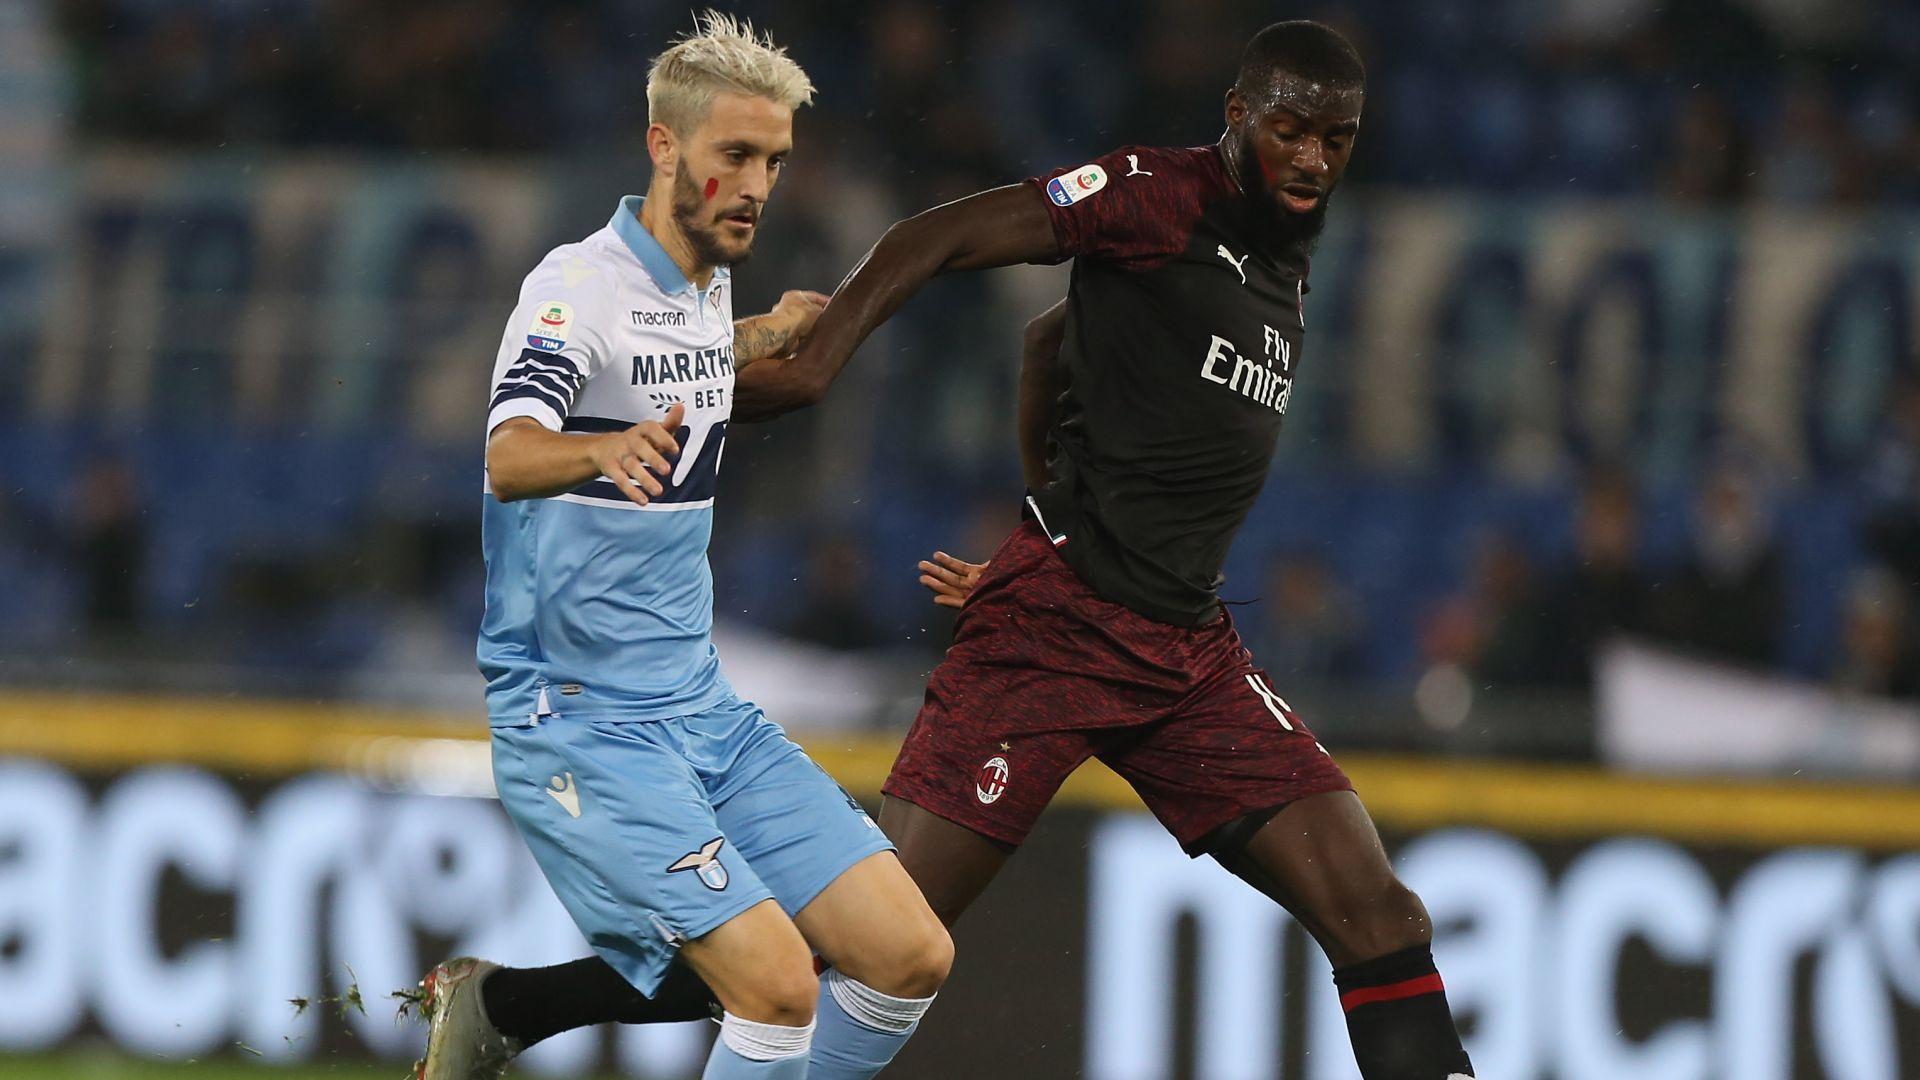 Luis Alberto Tiemoue Bakayoko Lazio Milan